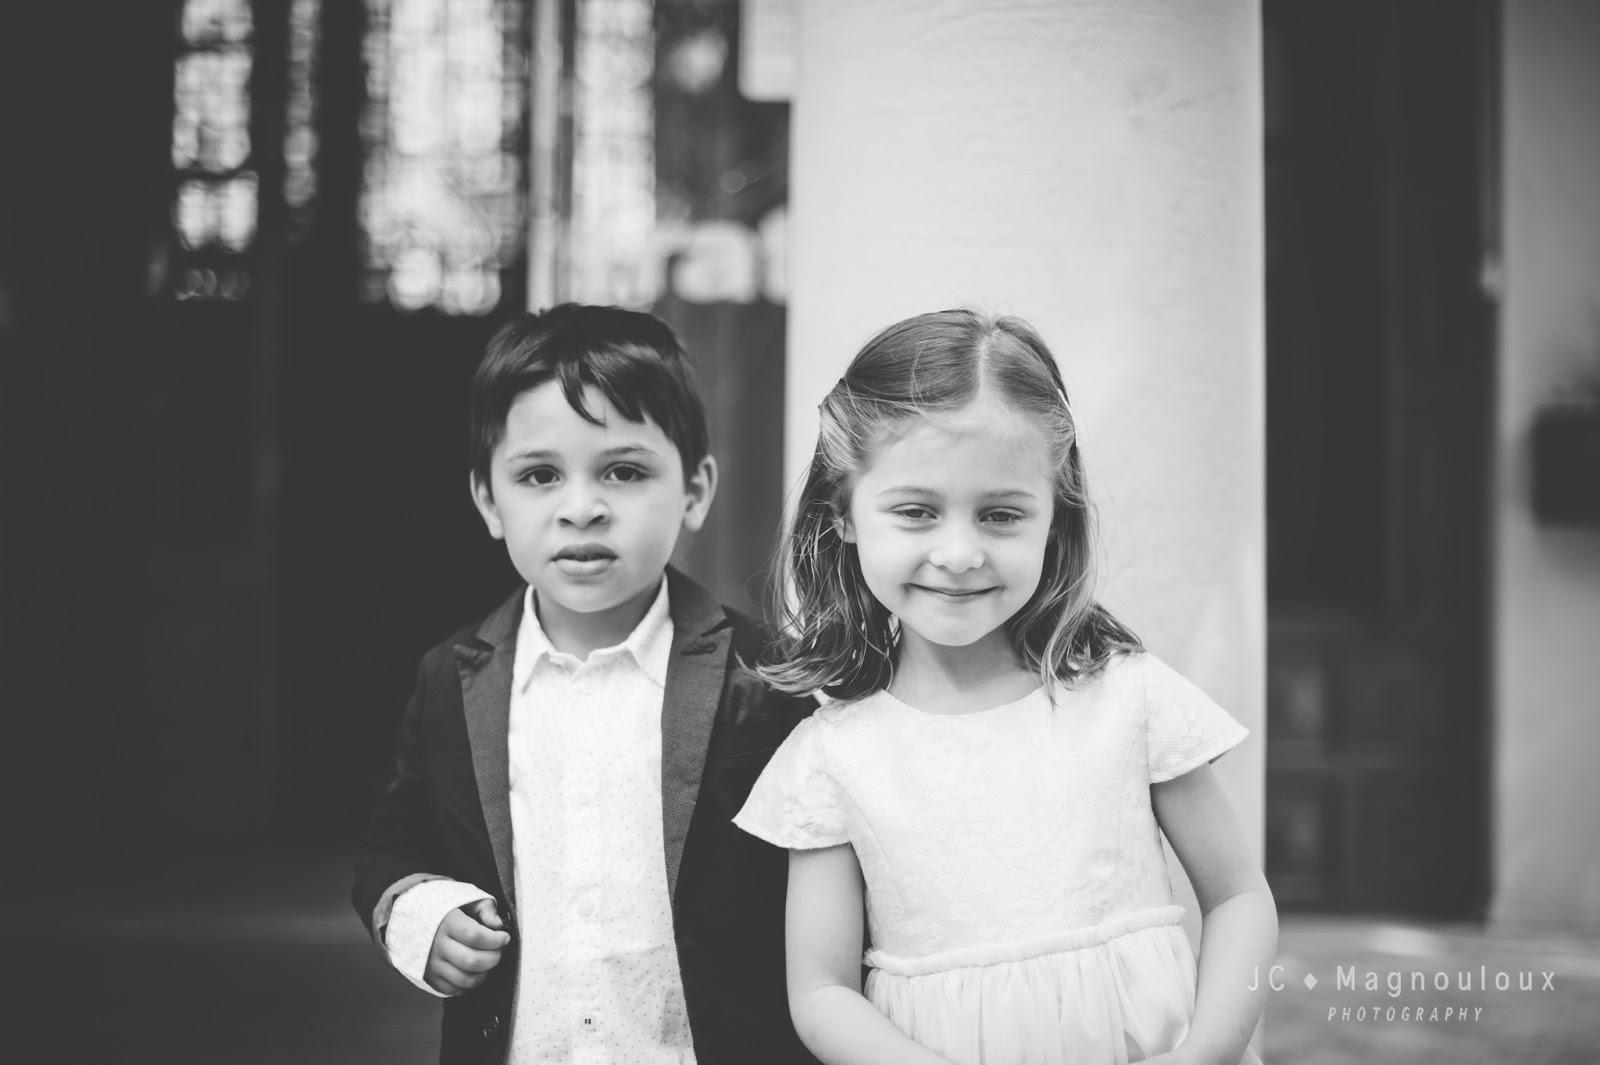 photographe mariage lyon roanne salle familiale rurale tartaras lyon X-PRO2